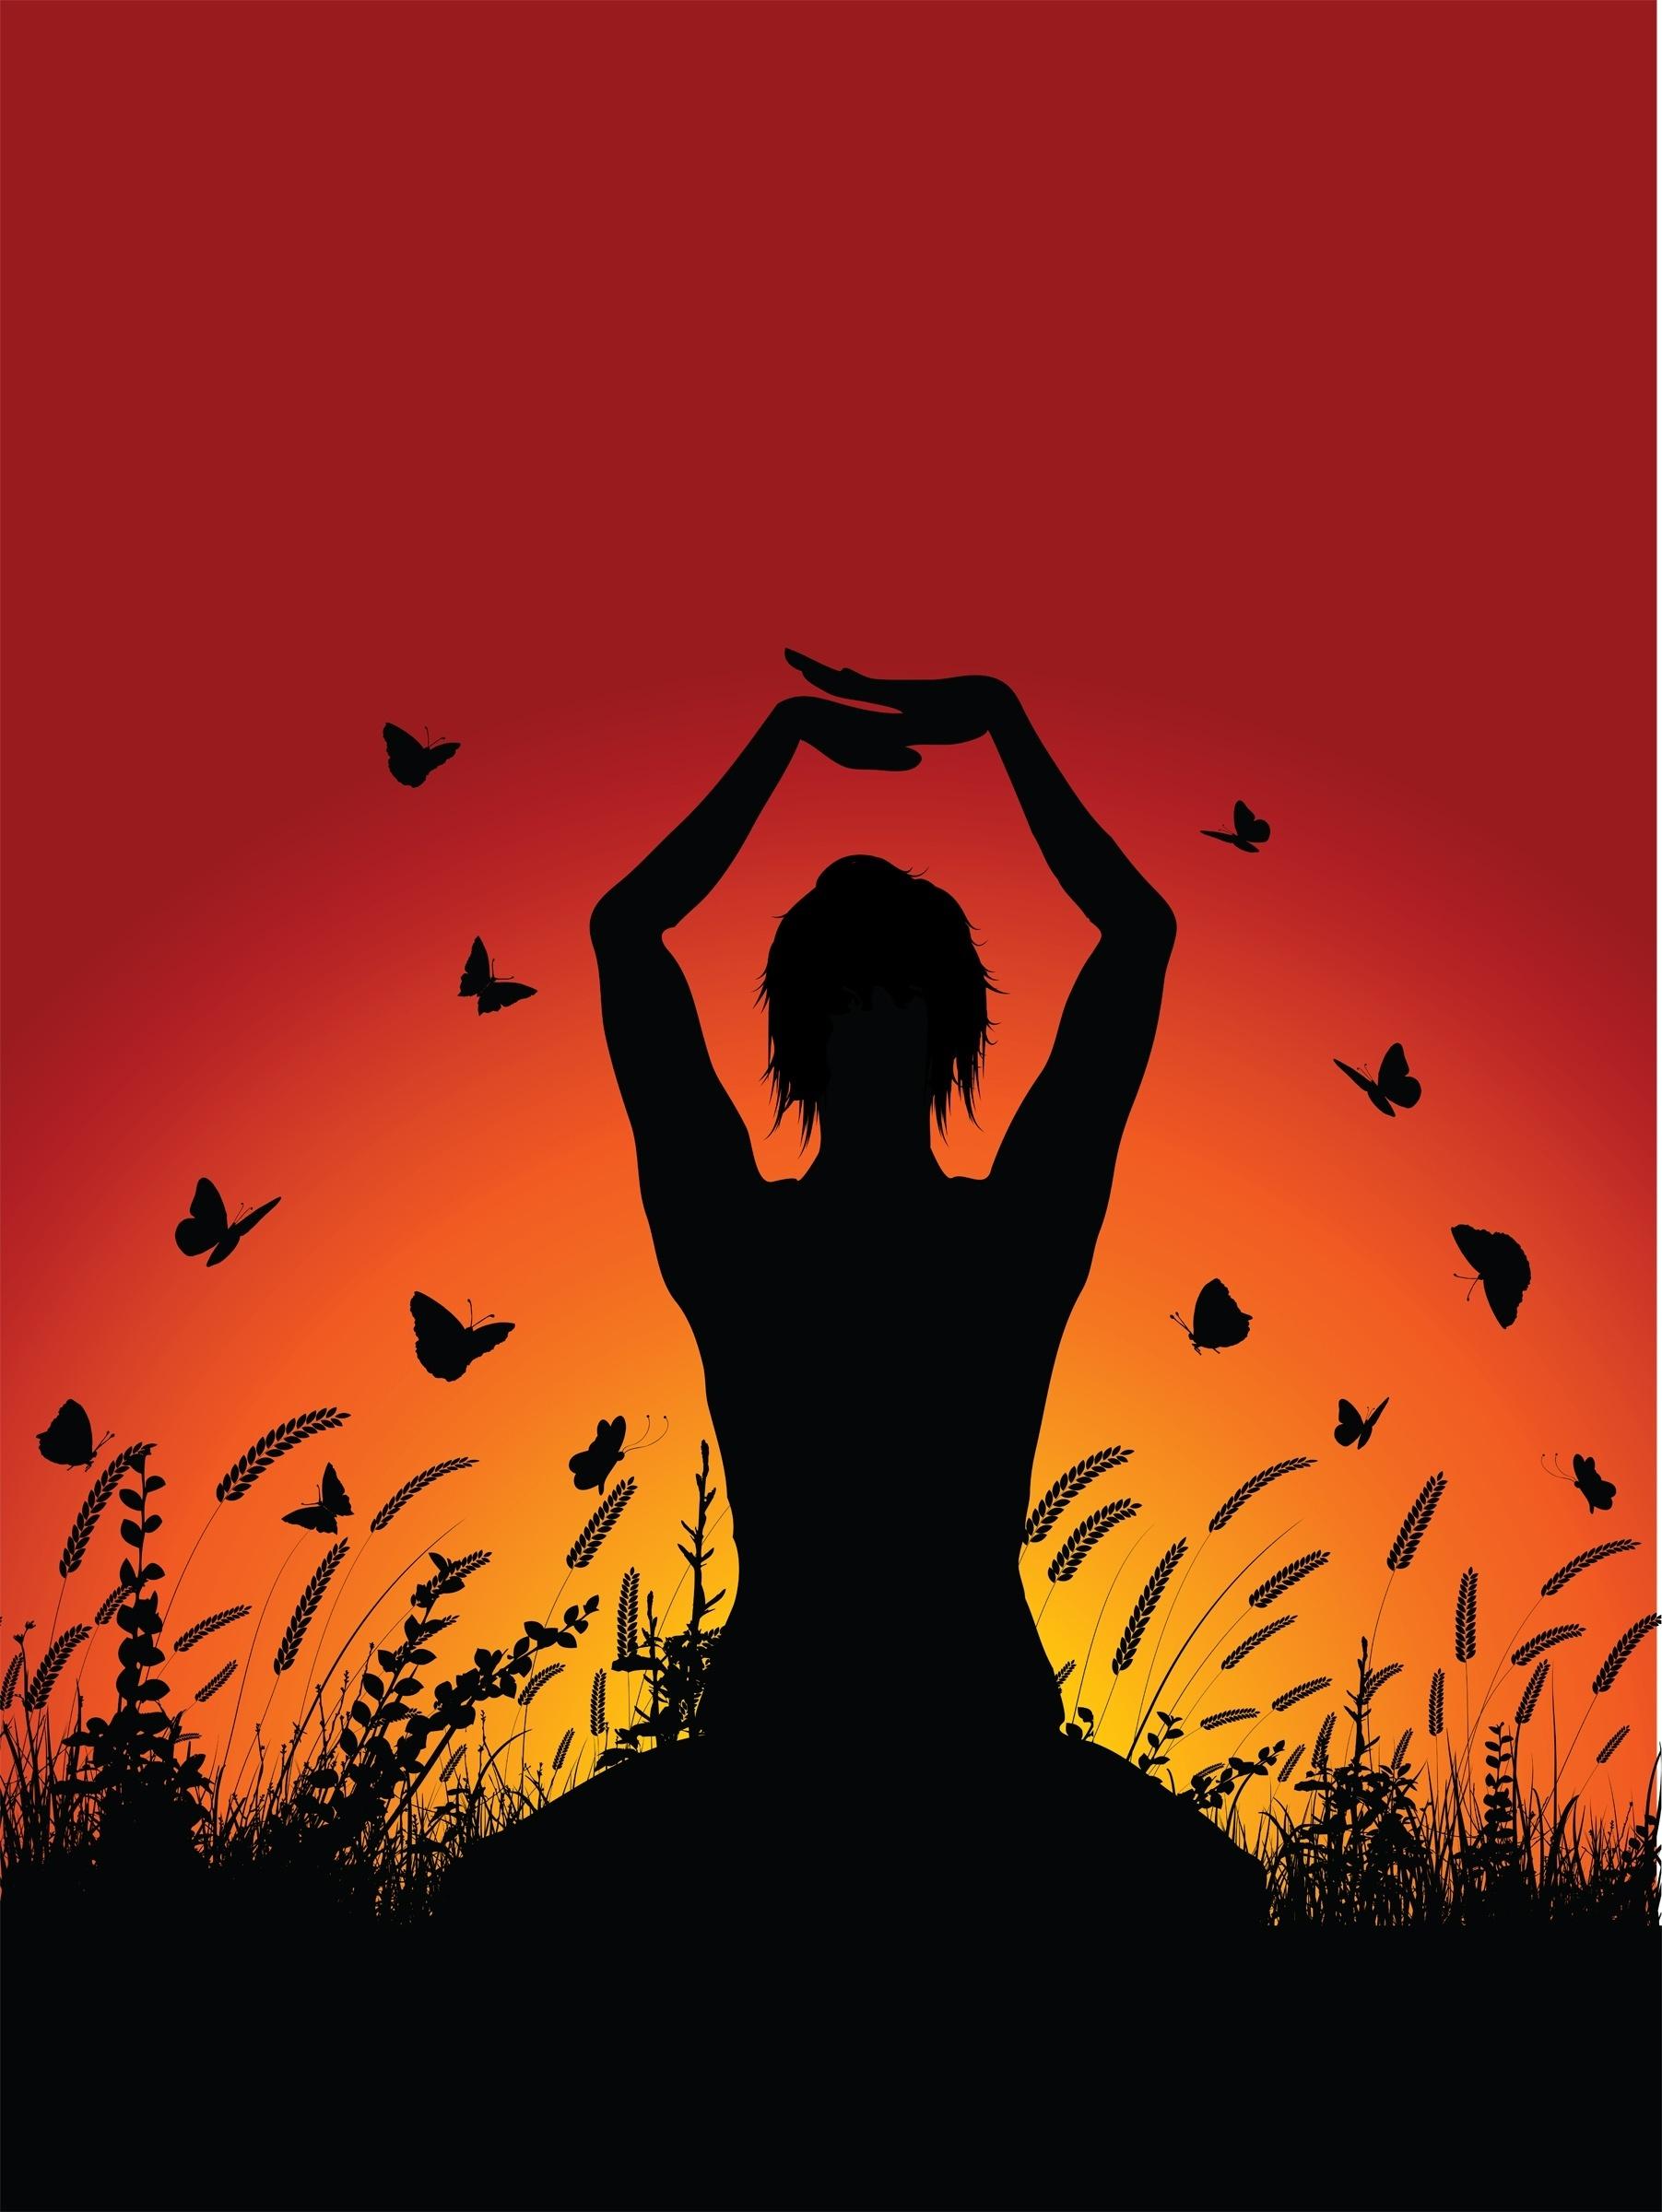 female_in_yoga_pose_against_sunset_sky_1003